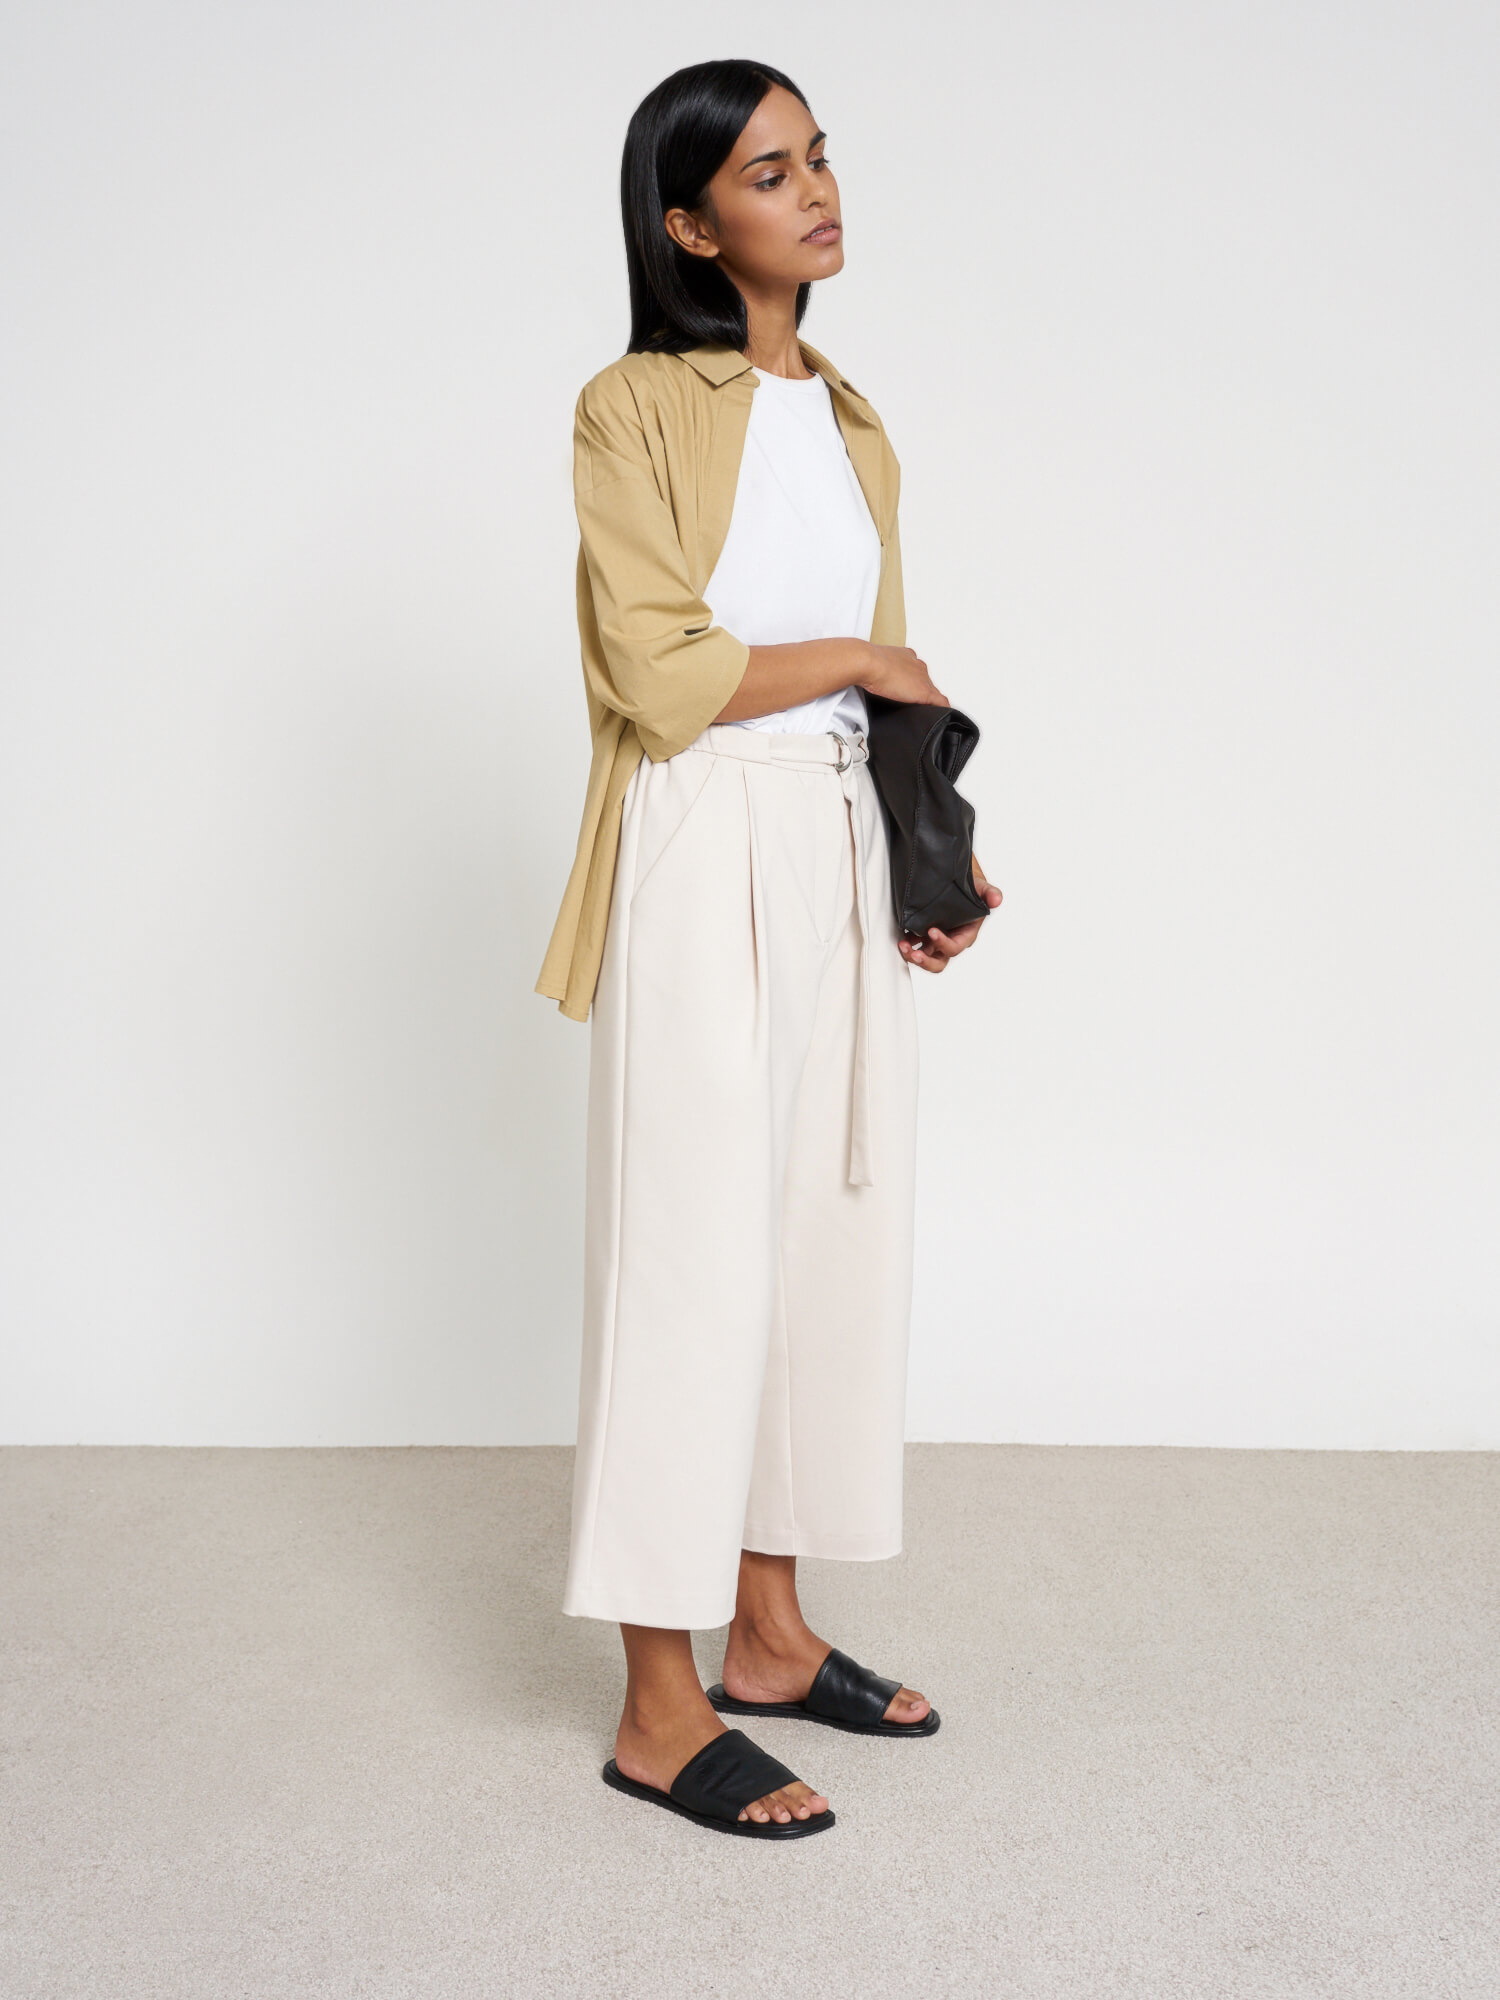 Рубашка Sienna с втачным карманом фото